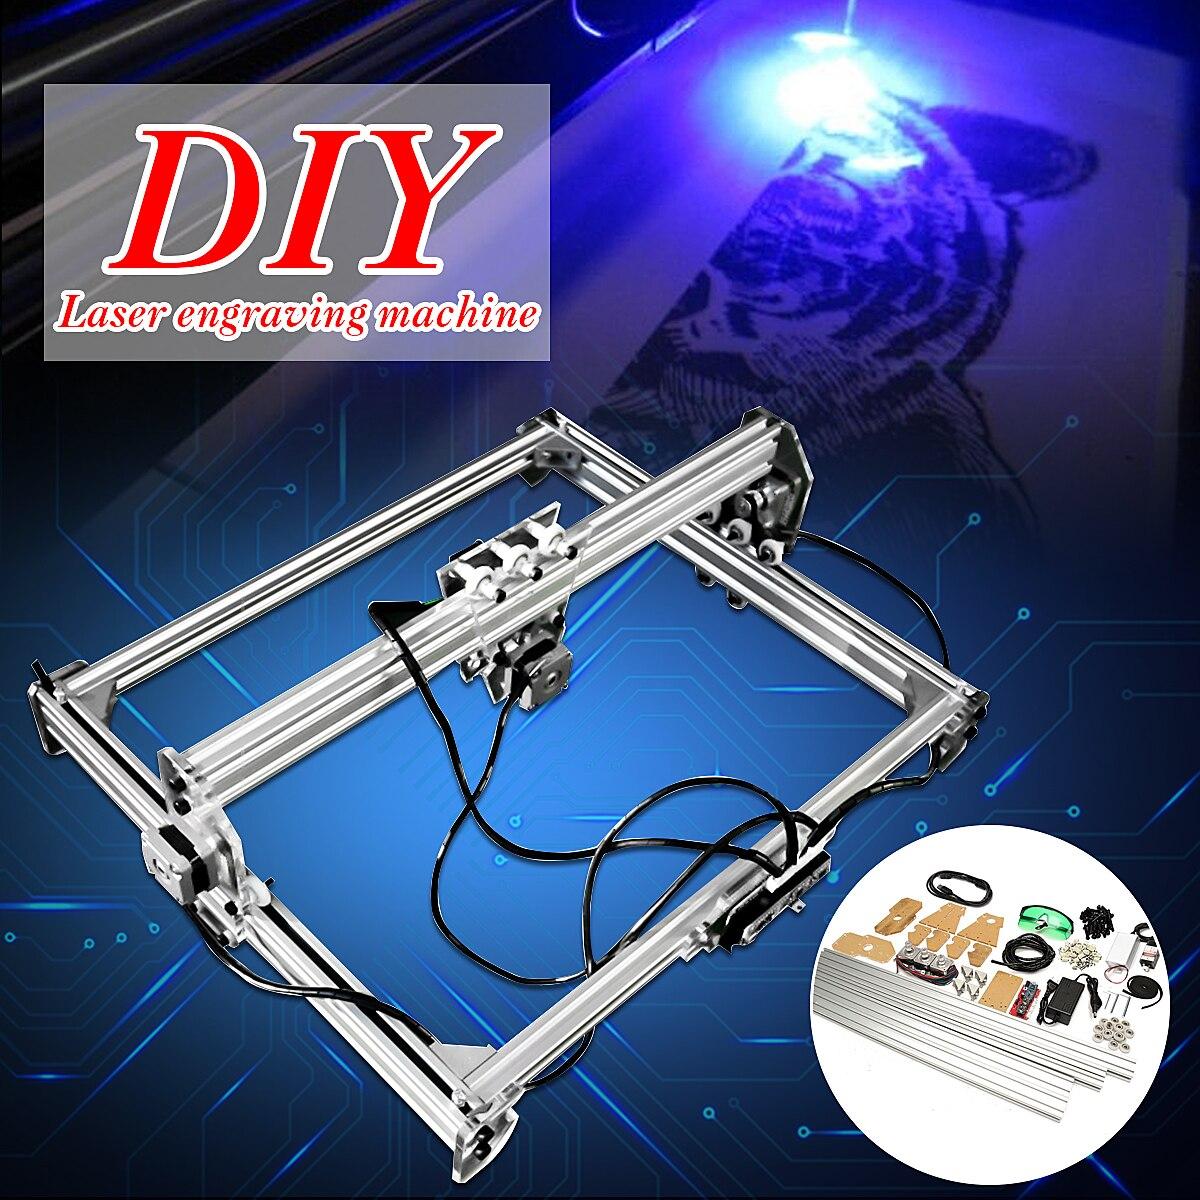 50*65cm Mini 3000MW azul máquina de grabado láser CNC 2 ejes DC 12V de grabador de escritorio de madera Router/cortadora/impresora + láser